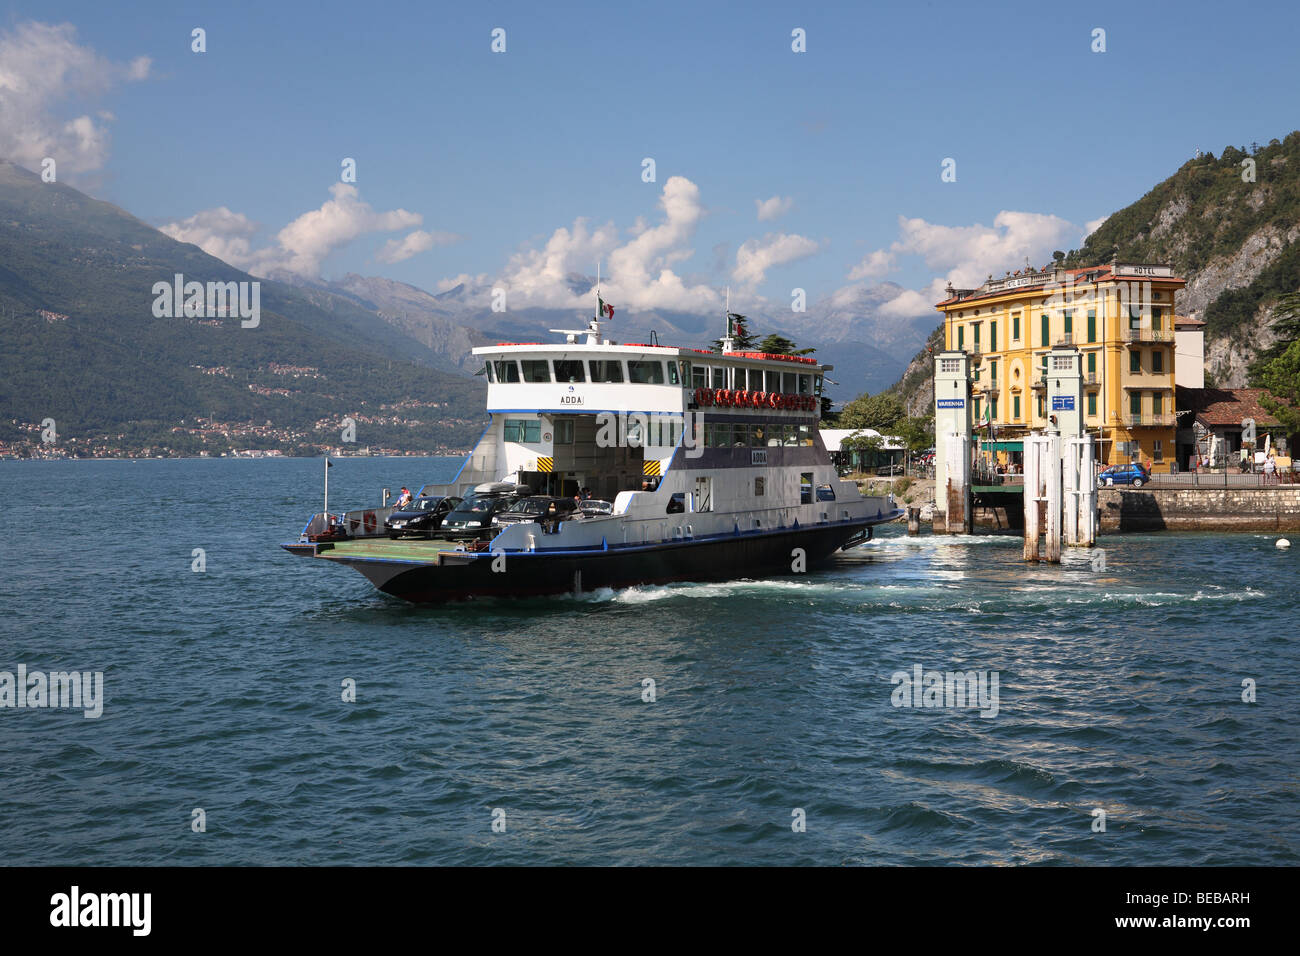 The Car Ferry Adda Leaving Varenna On Lake Como Italy Europe